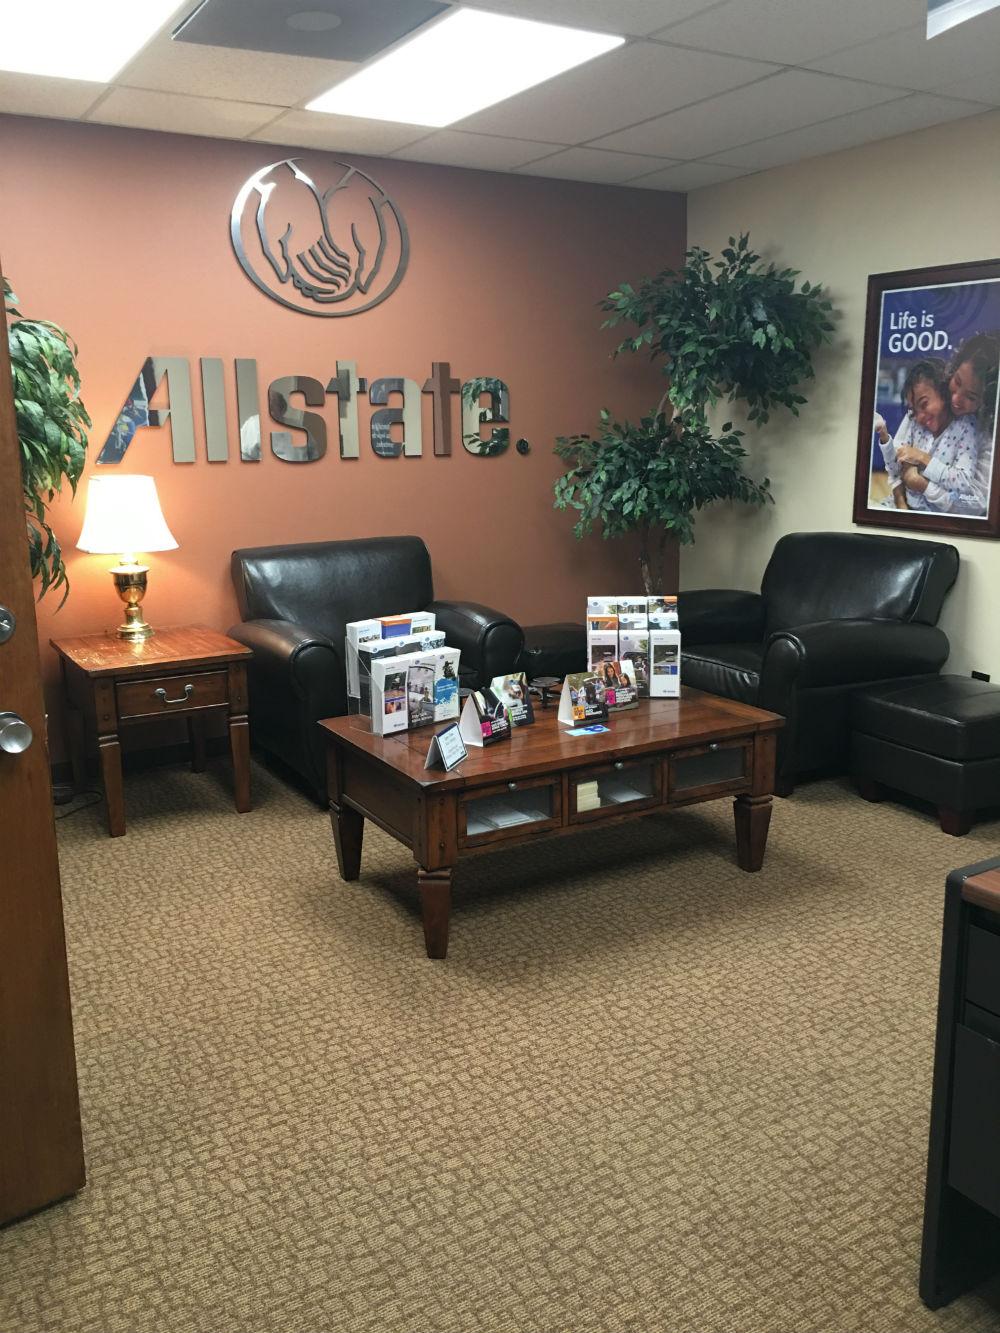 Allstate Insurance Agent: Roger Francis image 3